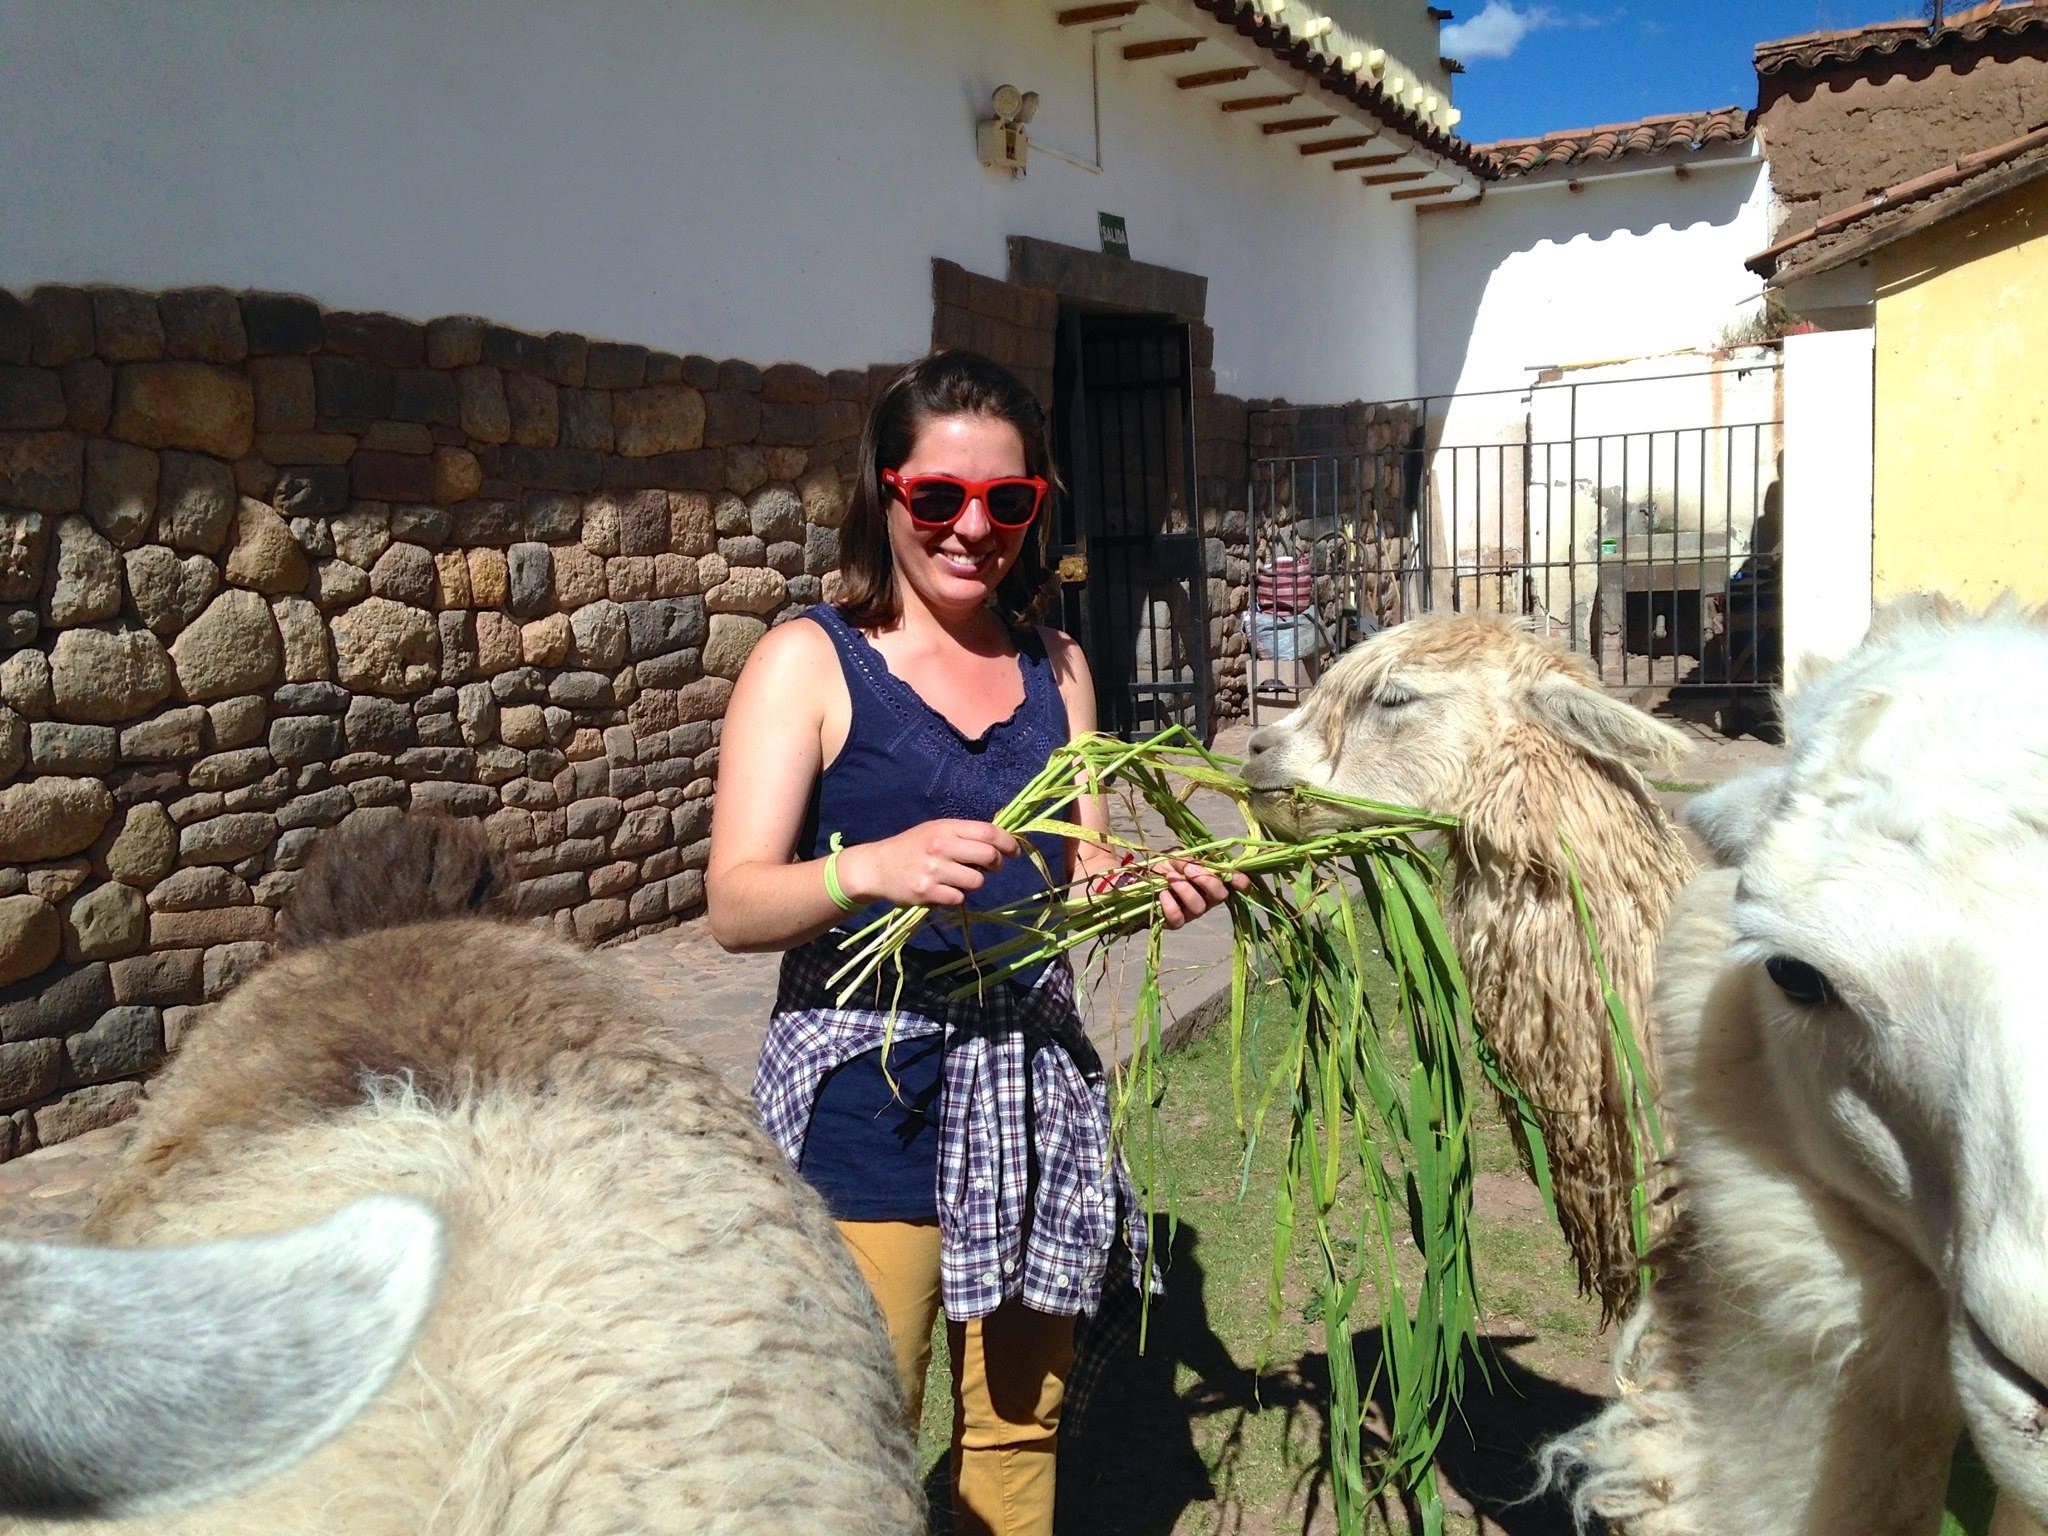 Feeding alpacas in Cusco, Peru